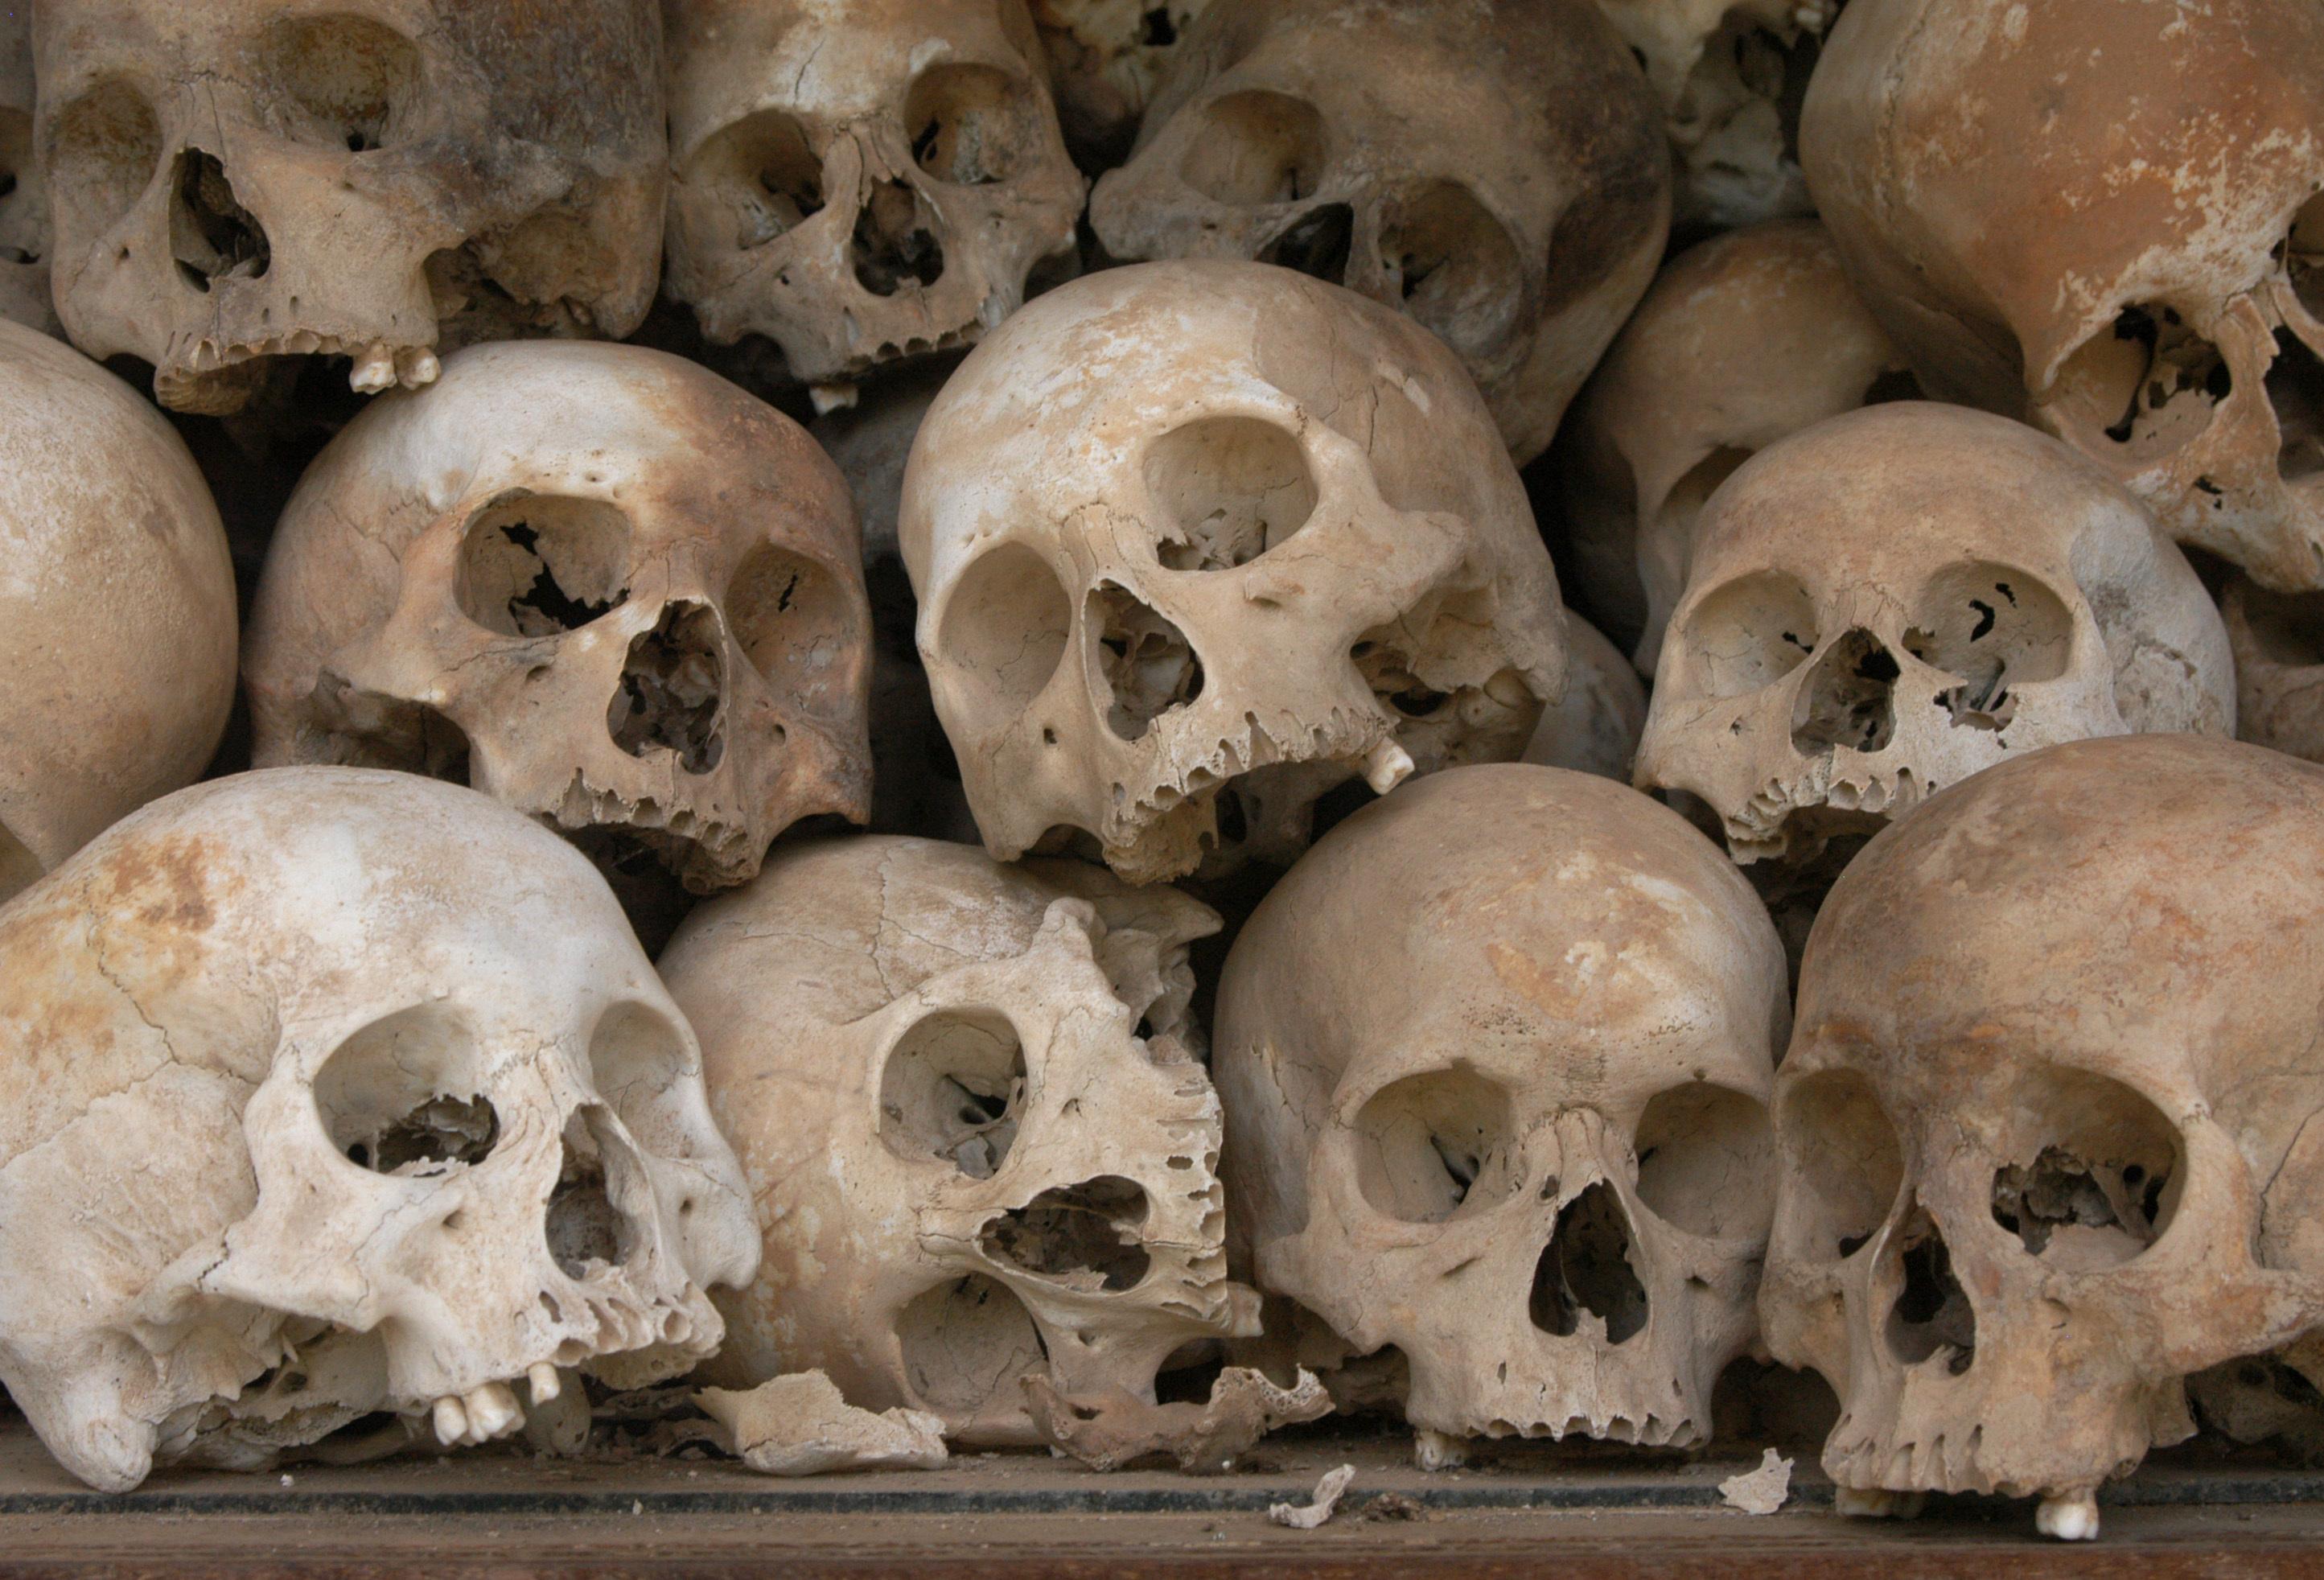 Pile of Skulls 2889x1964